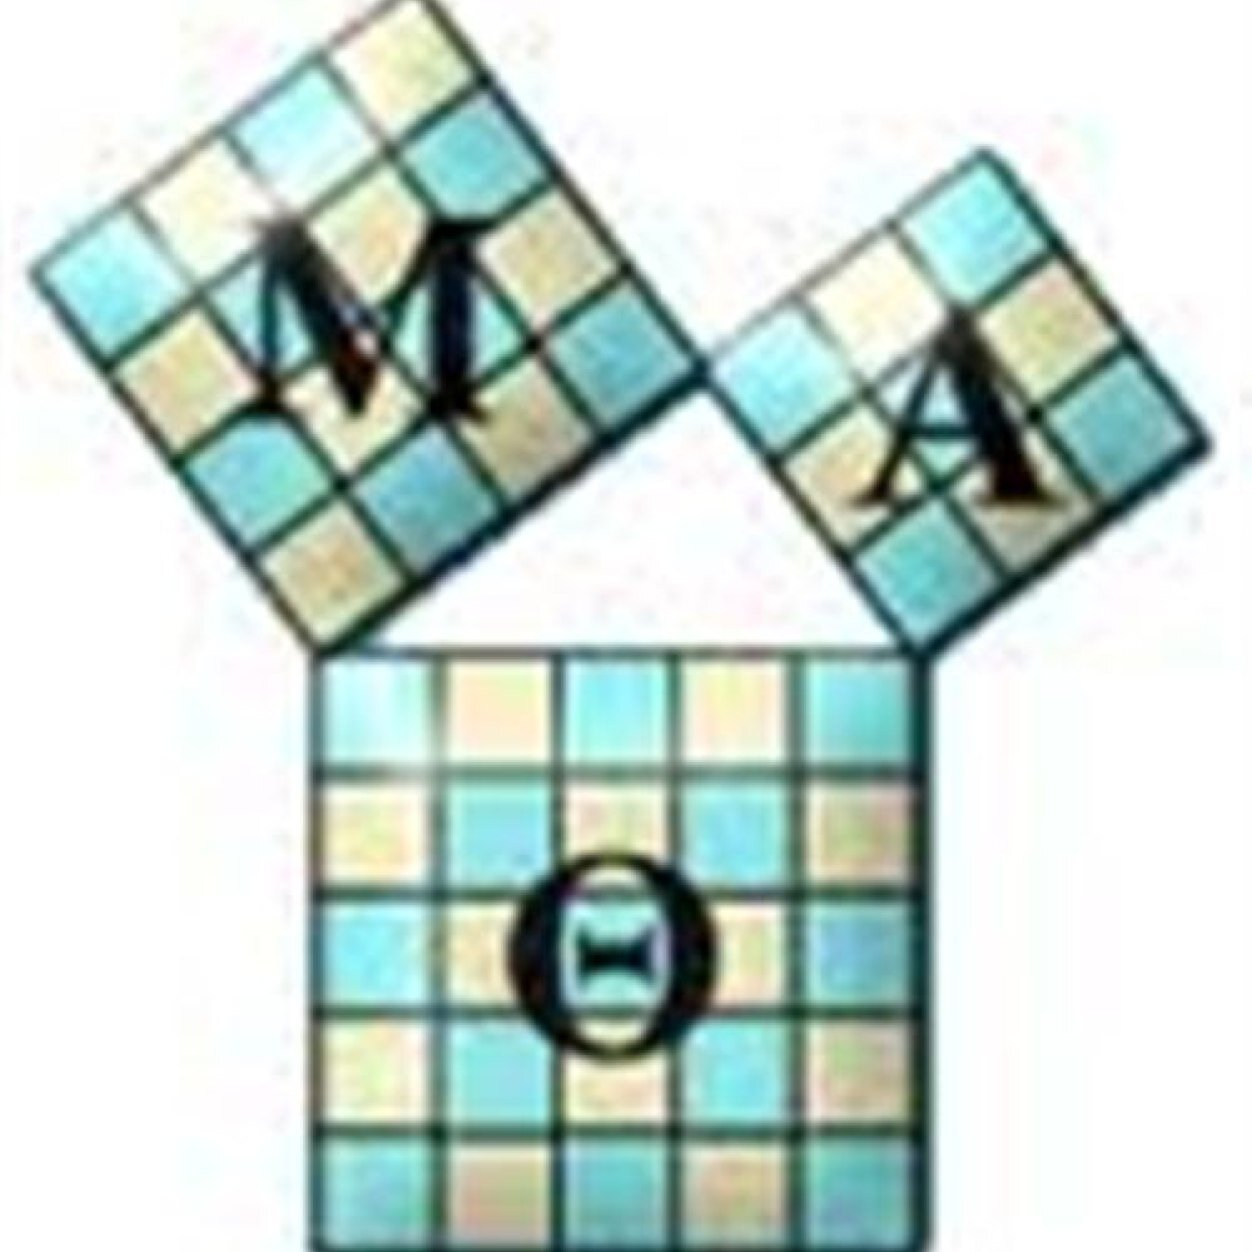 Nwr mu alpha theta nwrmao twitter nwr mu alpha theta buycottarizona Choice Image